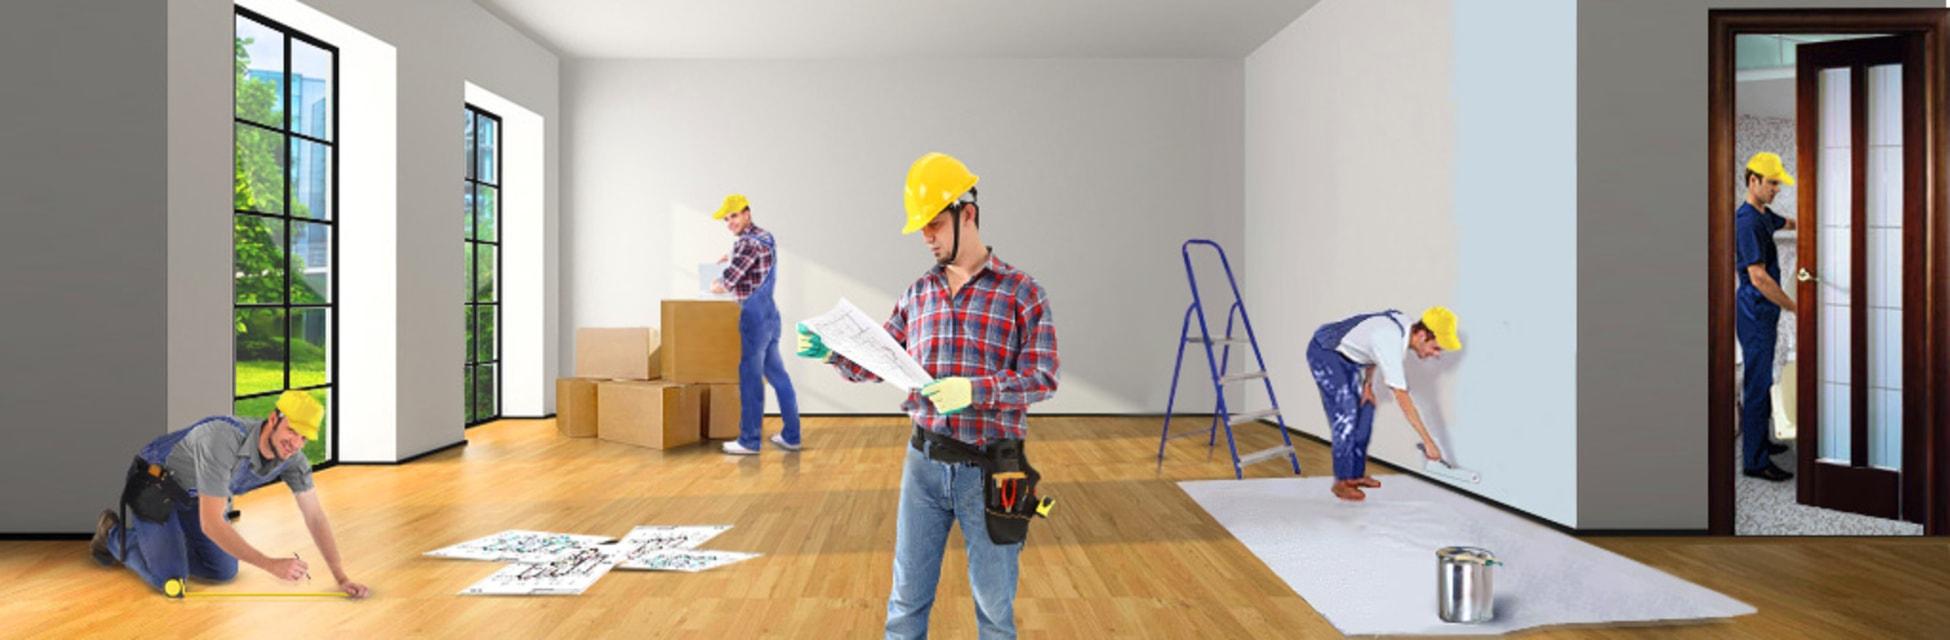 Ремонт квартир и строительство домов под ключ в Салехарде